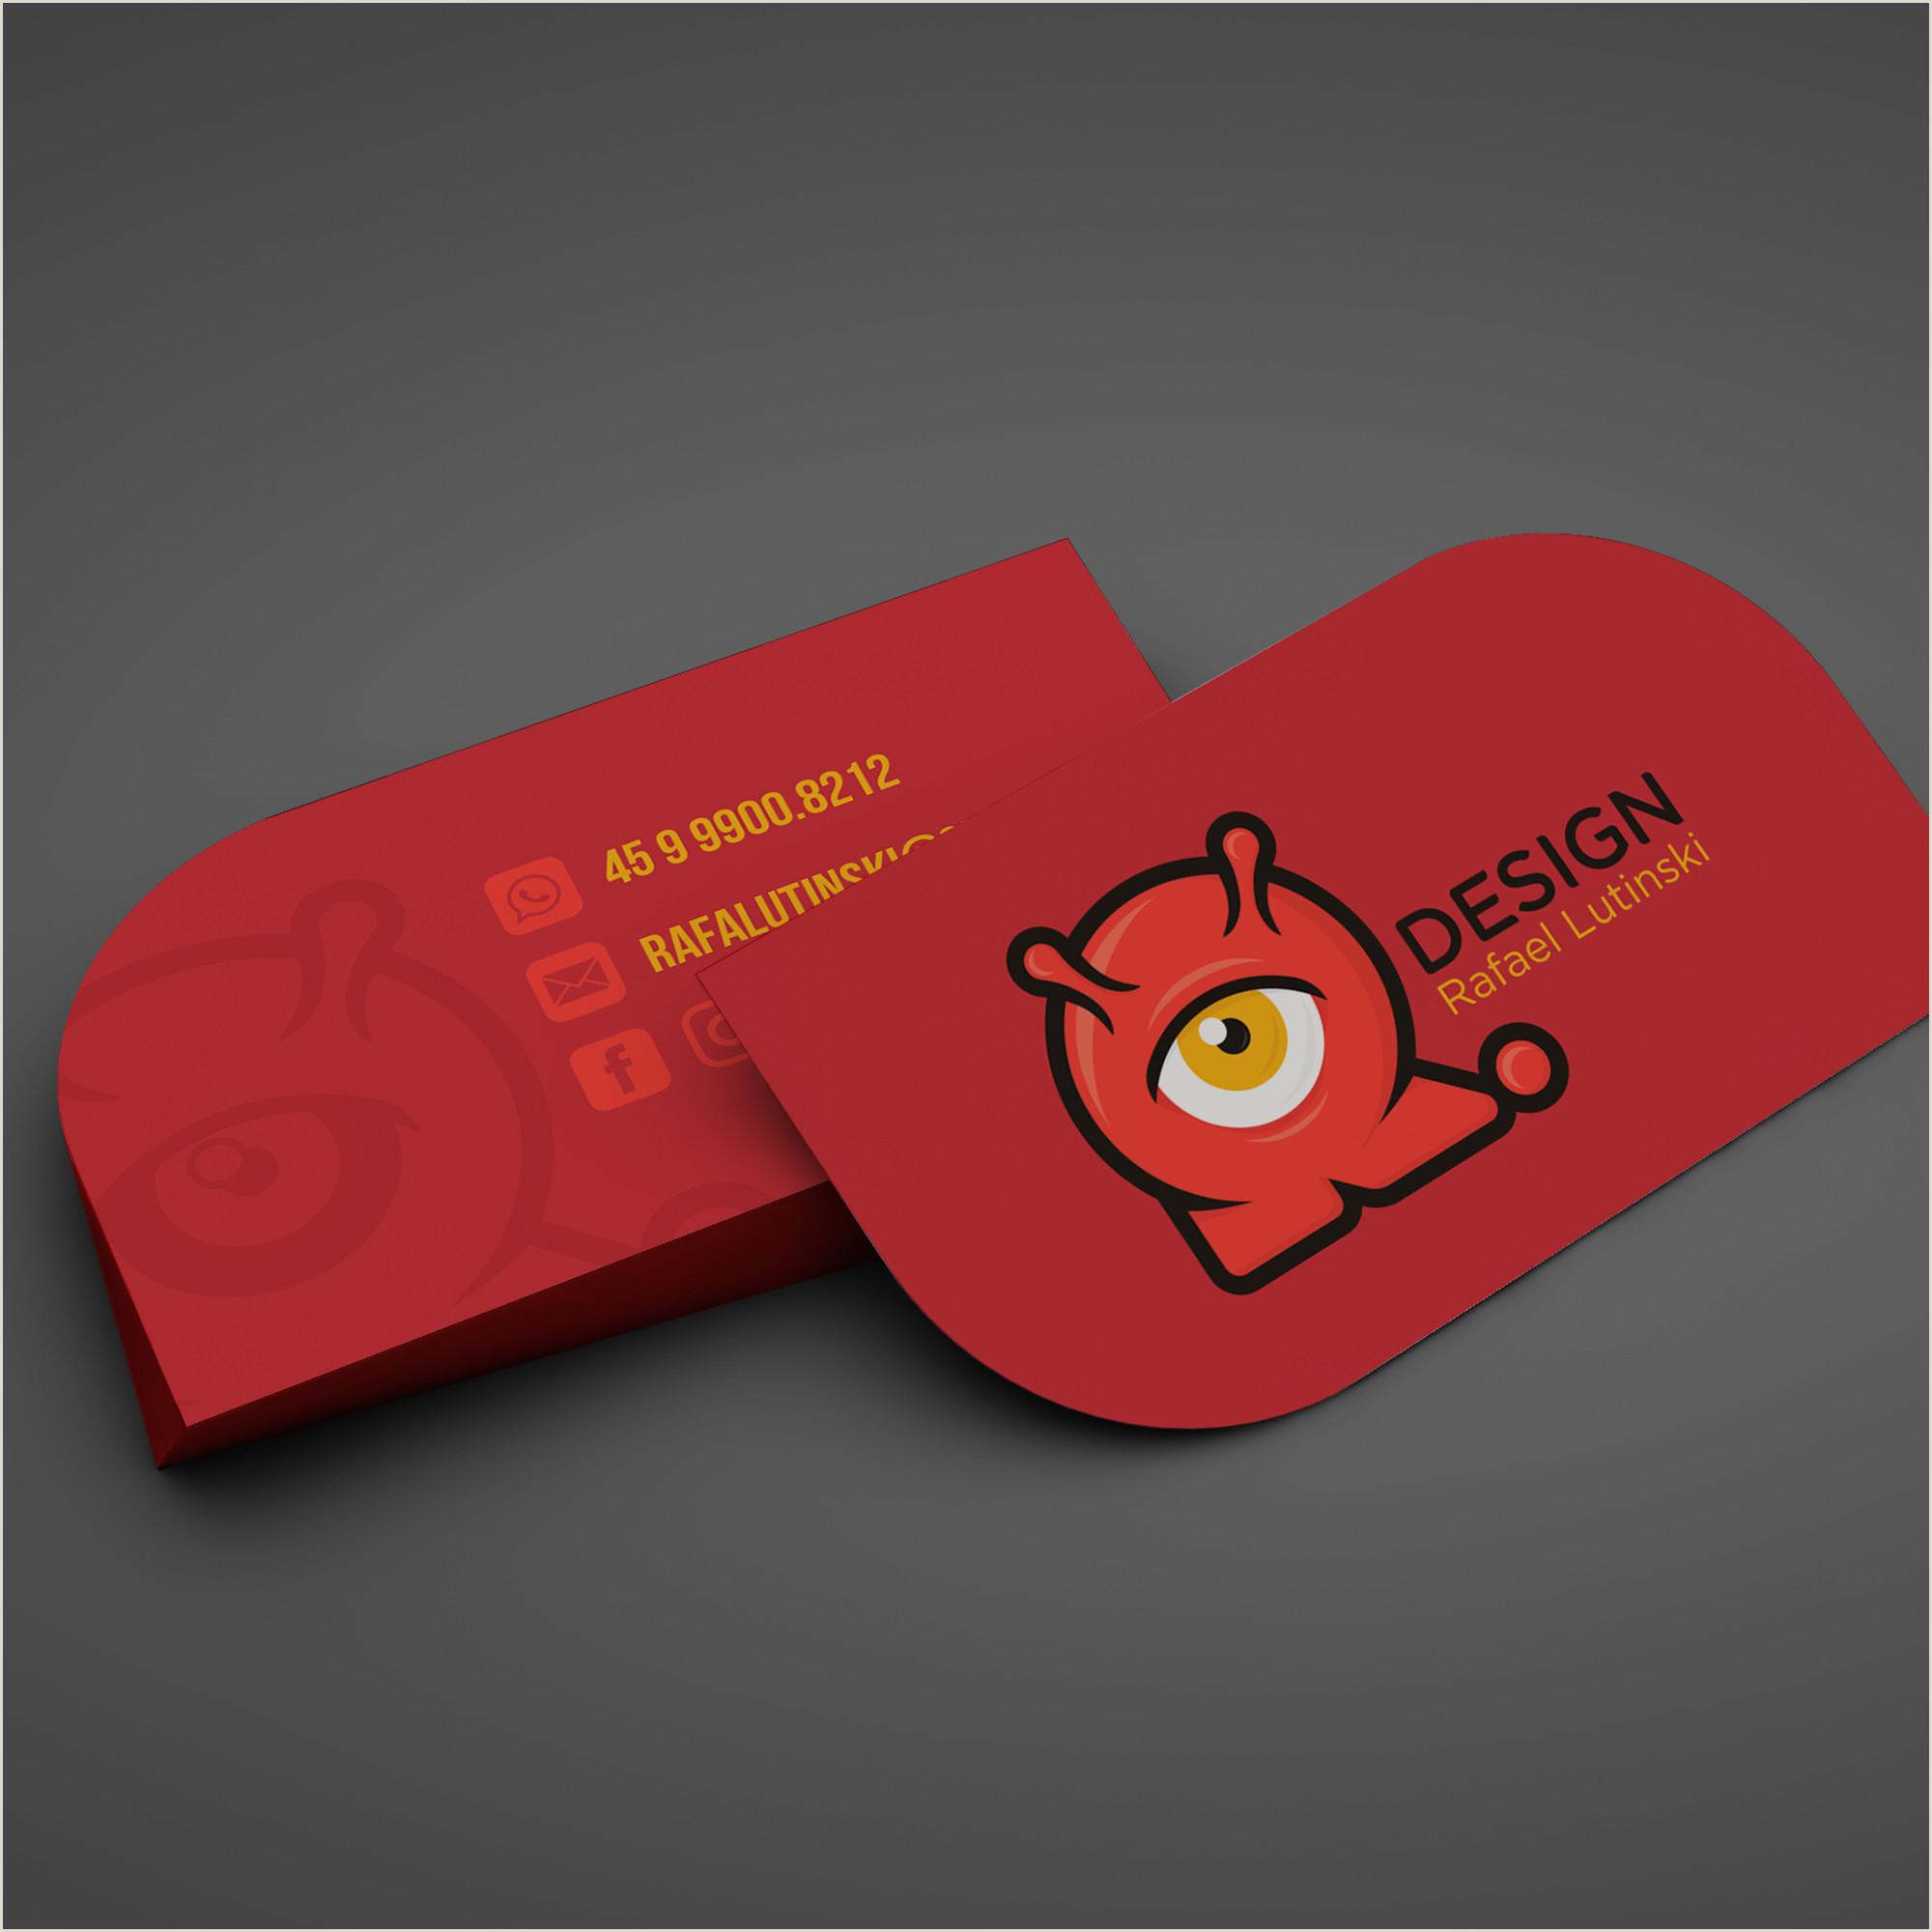 Die Cut Business Card Templates Custom Die Cut Business Cards Financeviewer